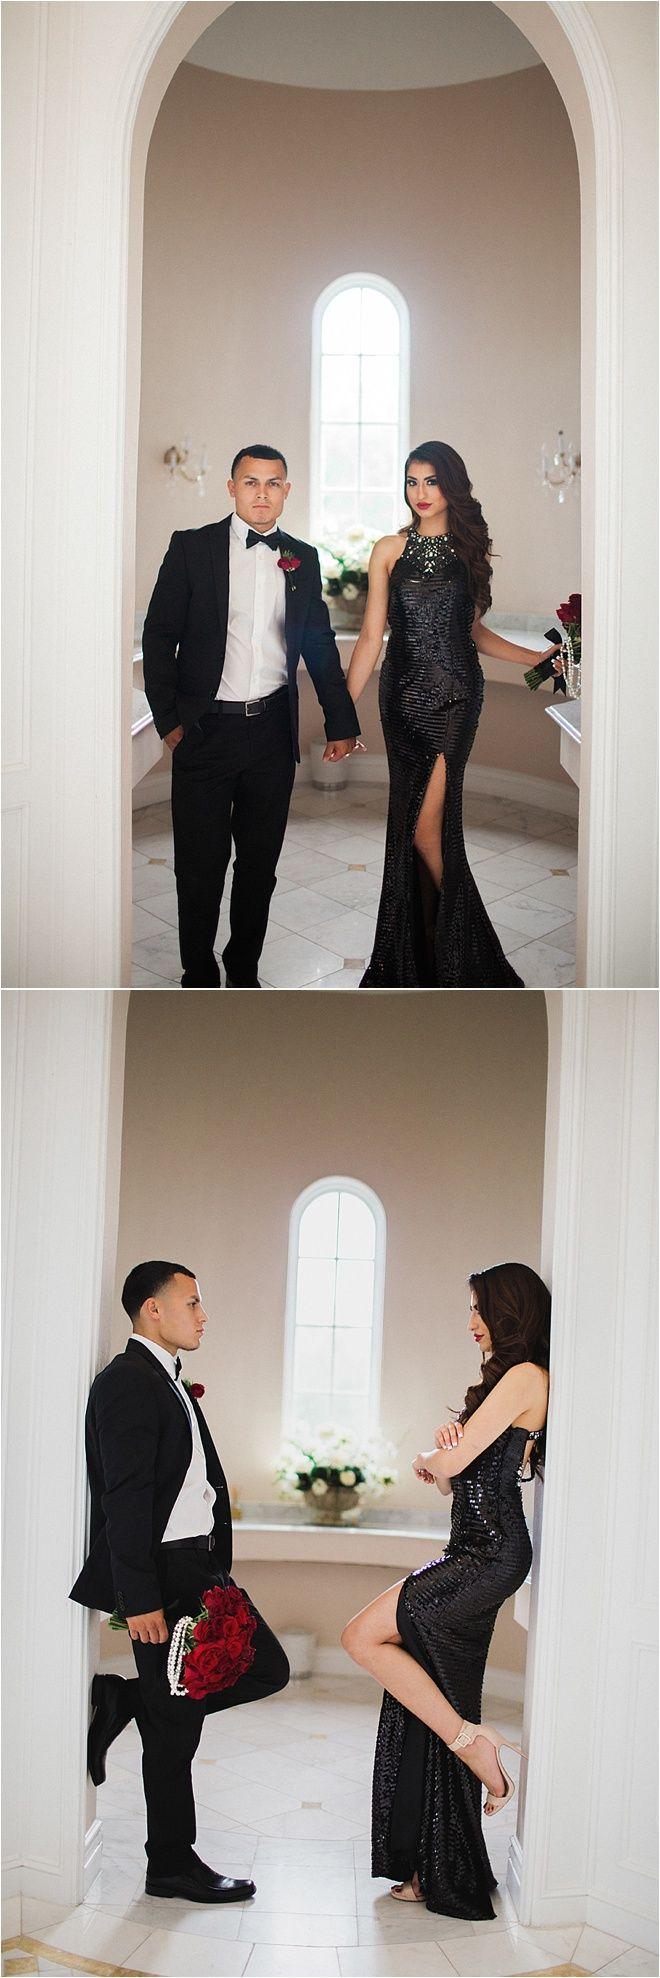 Formal-Engagement-Photos